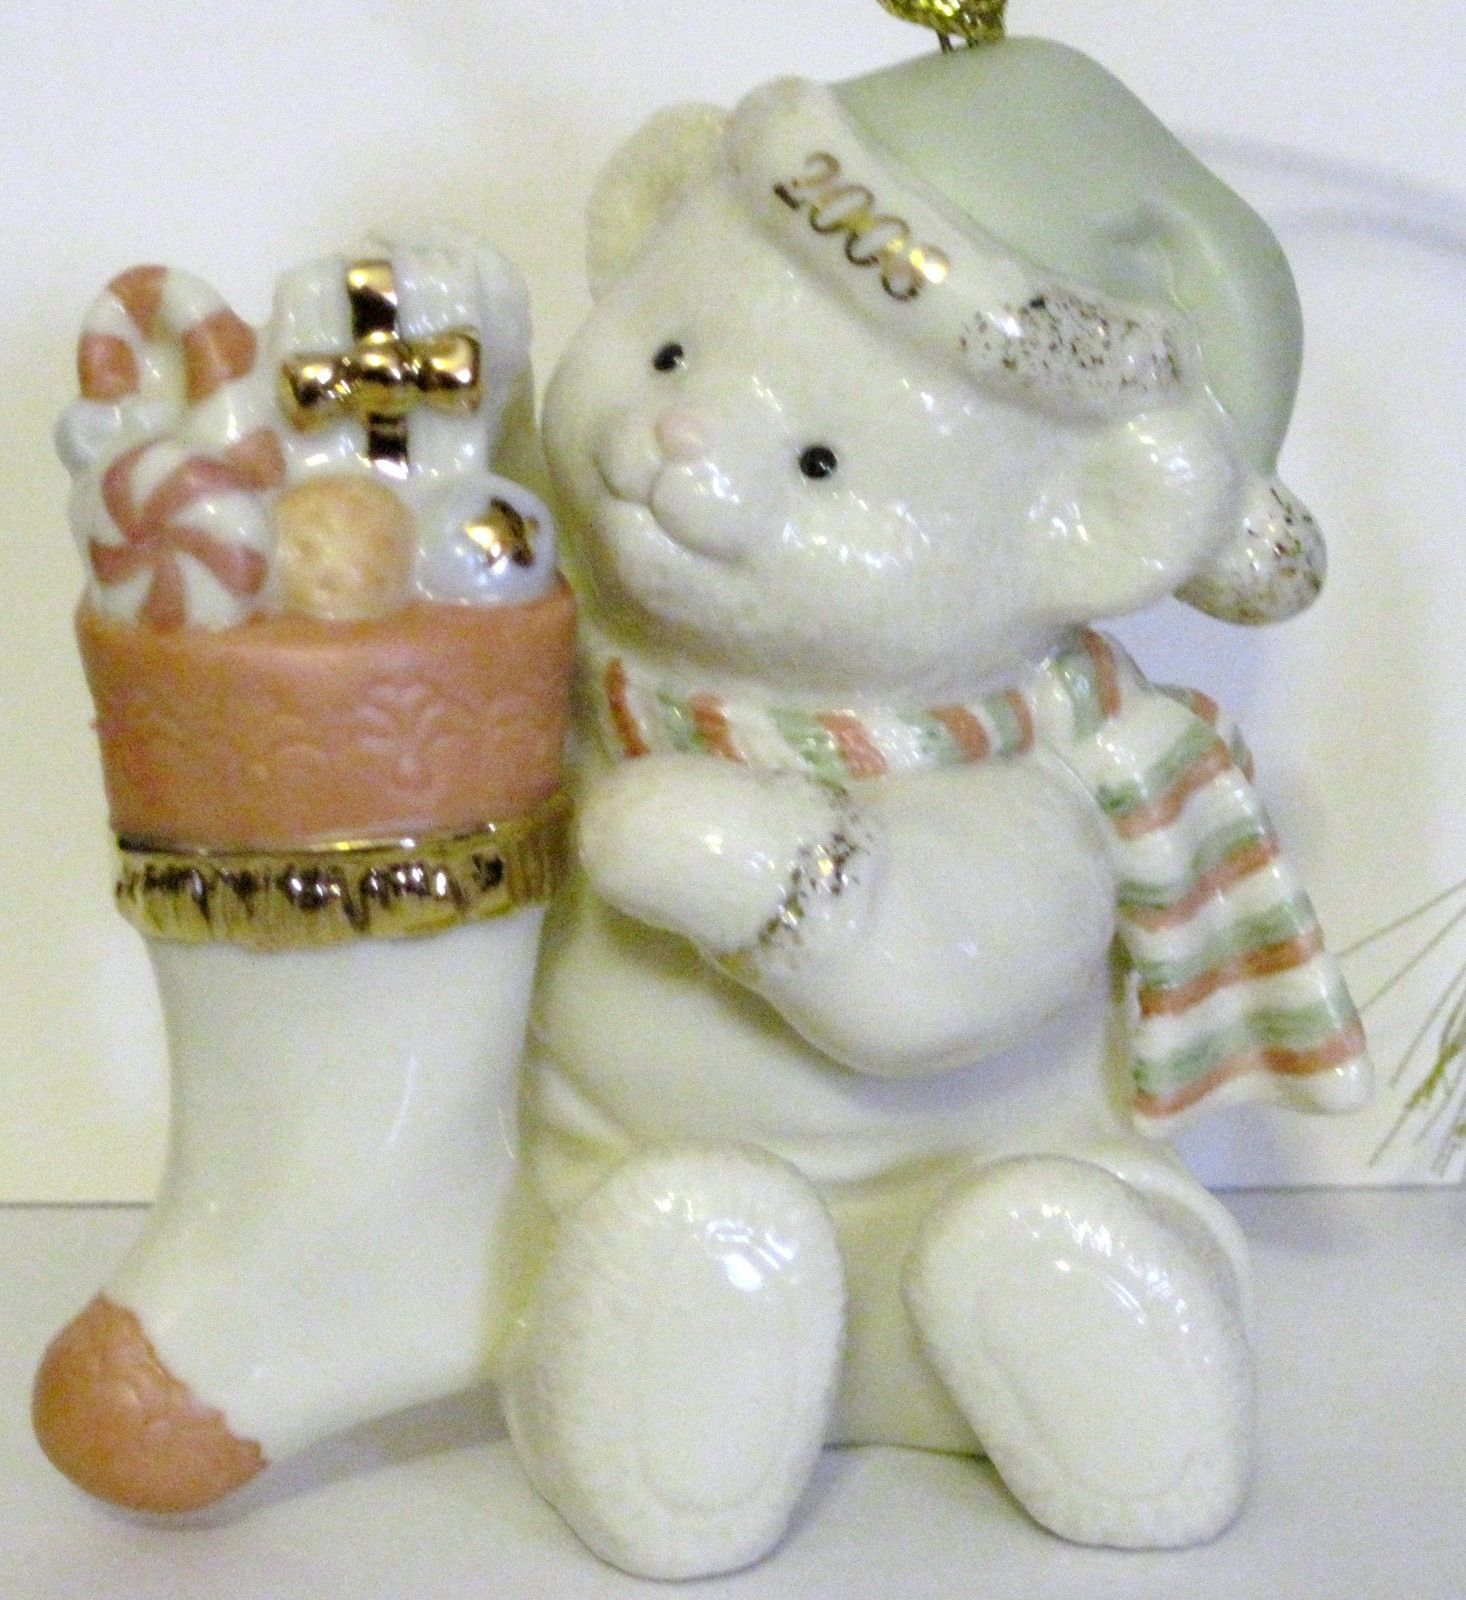 NIB Lenox 2008 Annual Teddy's Special Stocking  Christmas Ornament Bear fine chi image 3